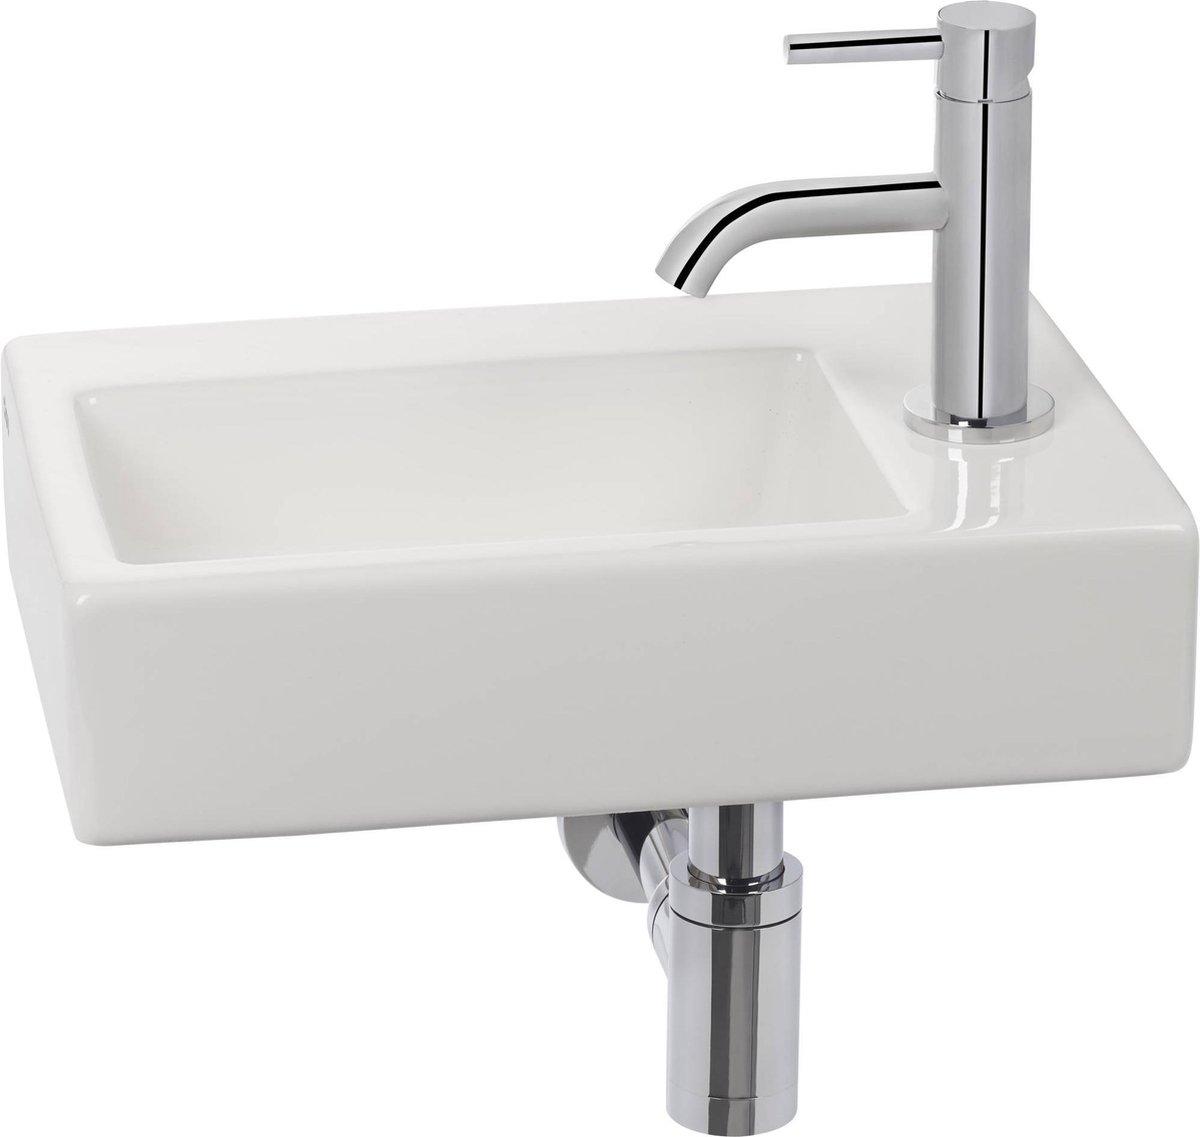 Clou Flush 2 Complete Fonteinset rechts Wit/Chroom